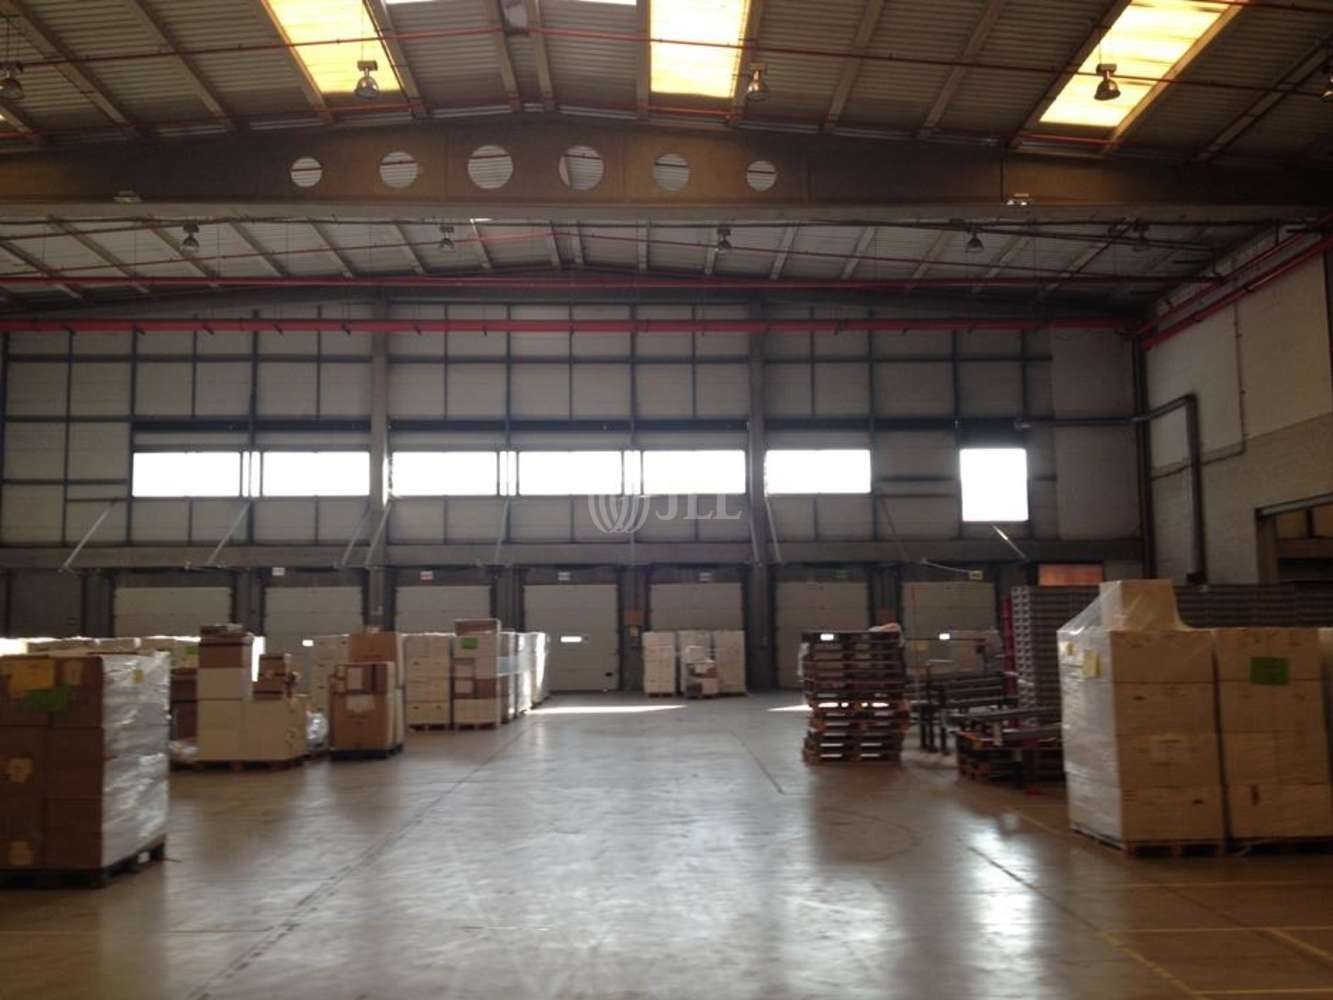 Naves industriales y logísticas Barcelona, 08040 - Nave Logistica - B0059 - PI PARC LOGISTIC ZONA FRANCA - 11509